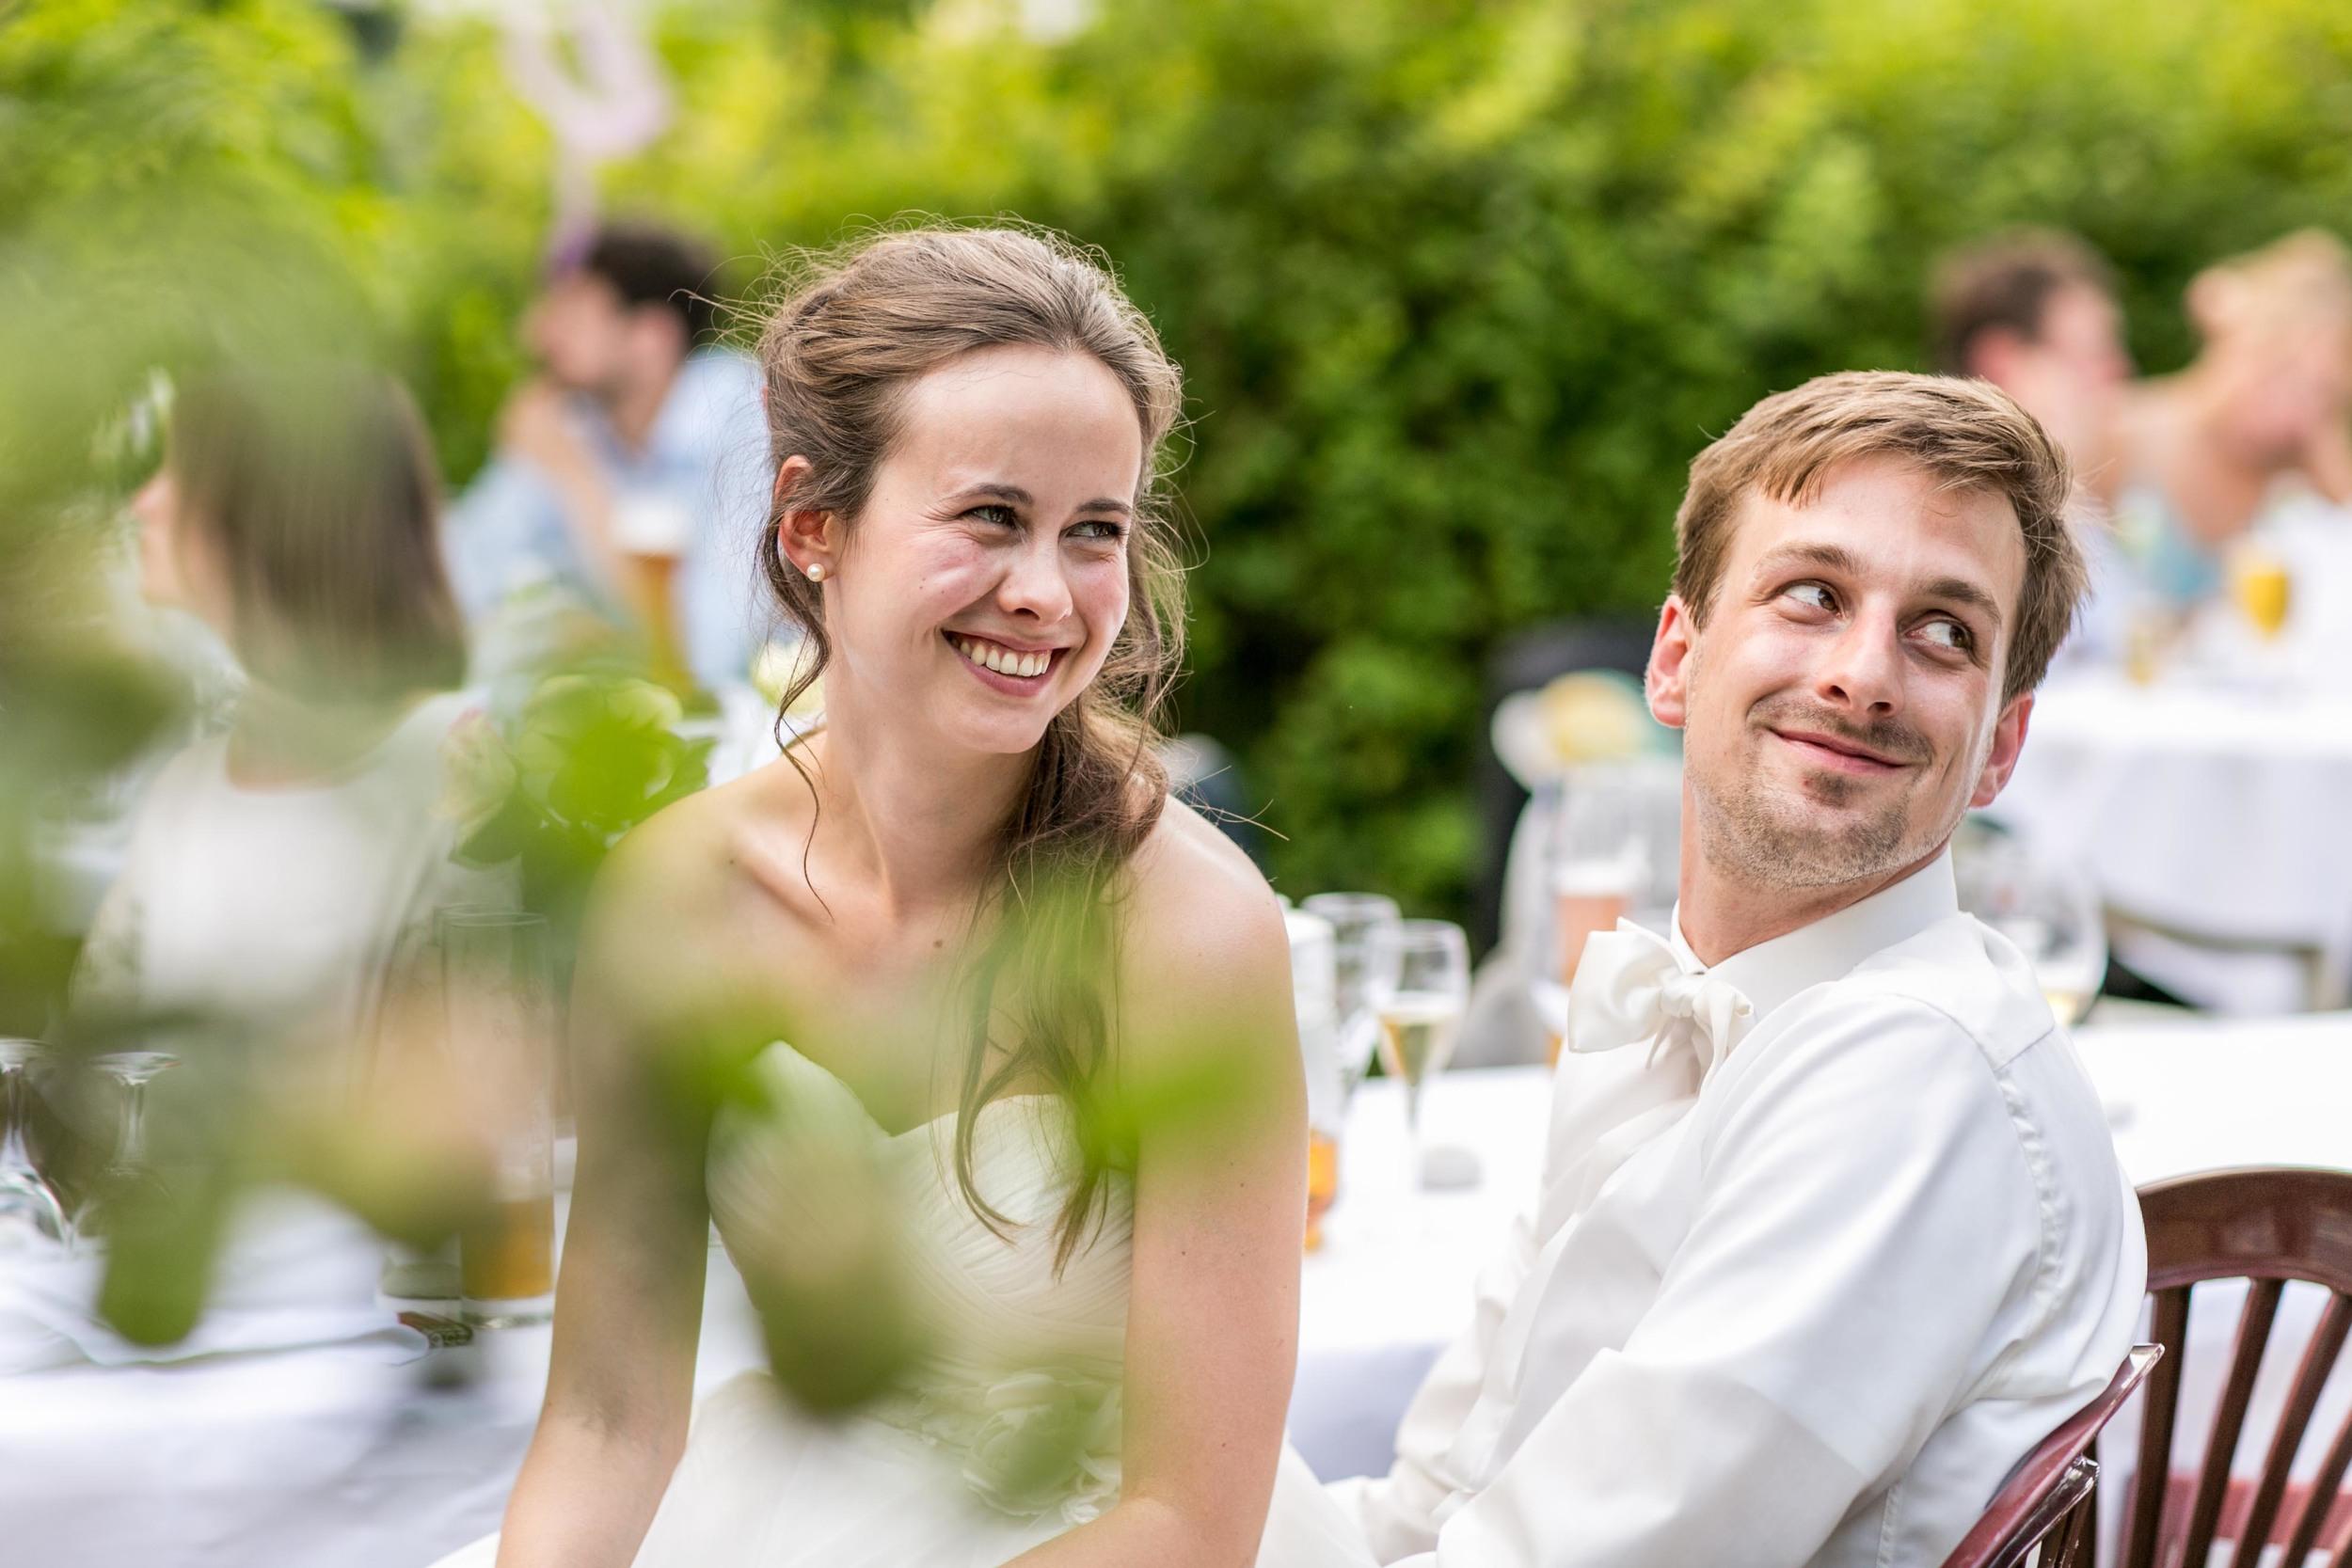 Berlin Hochzeitsfotografie_Fran Burrows Fotografie-56.jpg